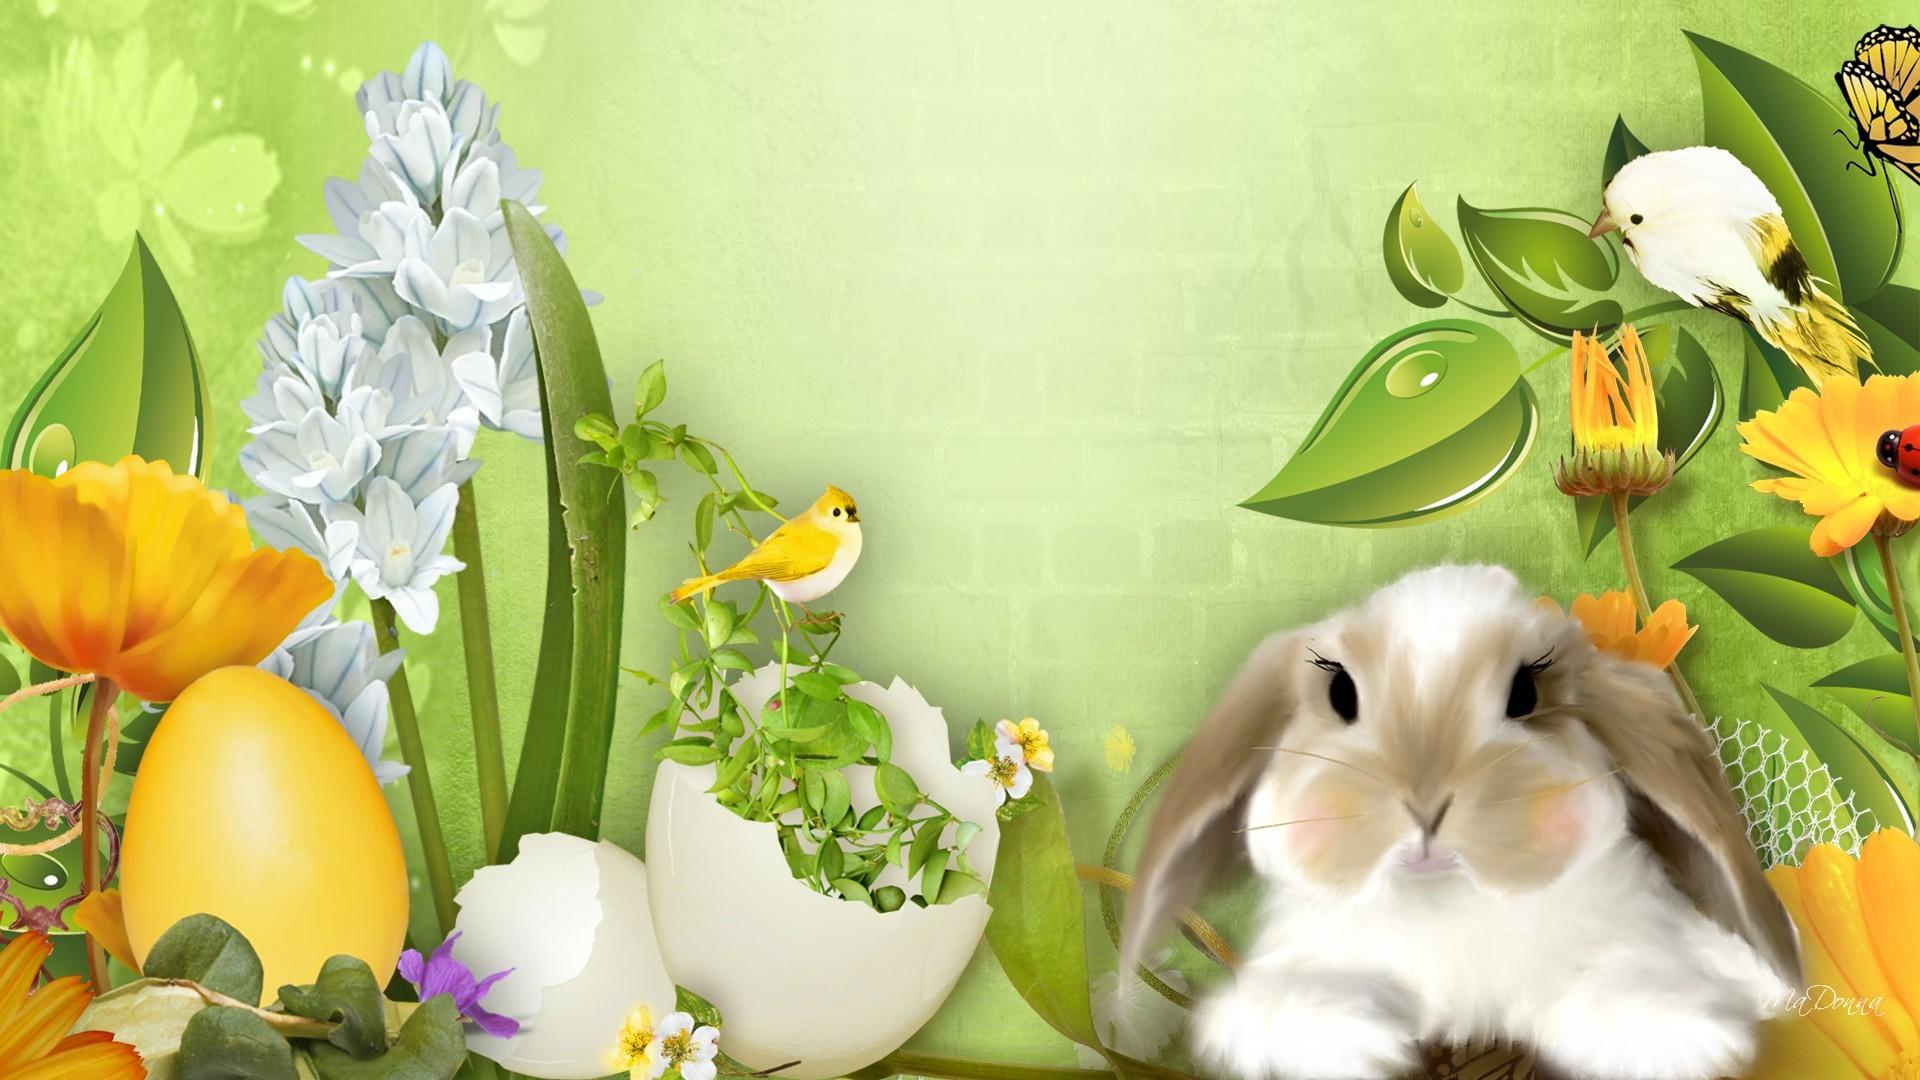 Wallpaper: Easter 2014 HD